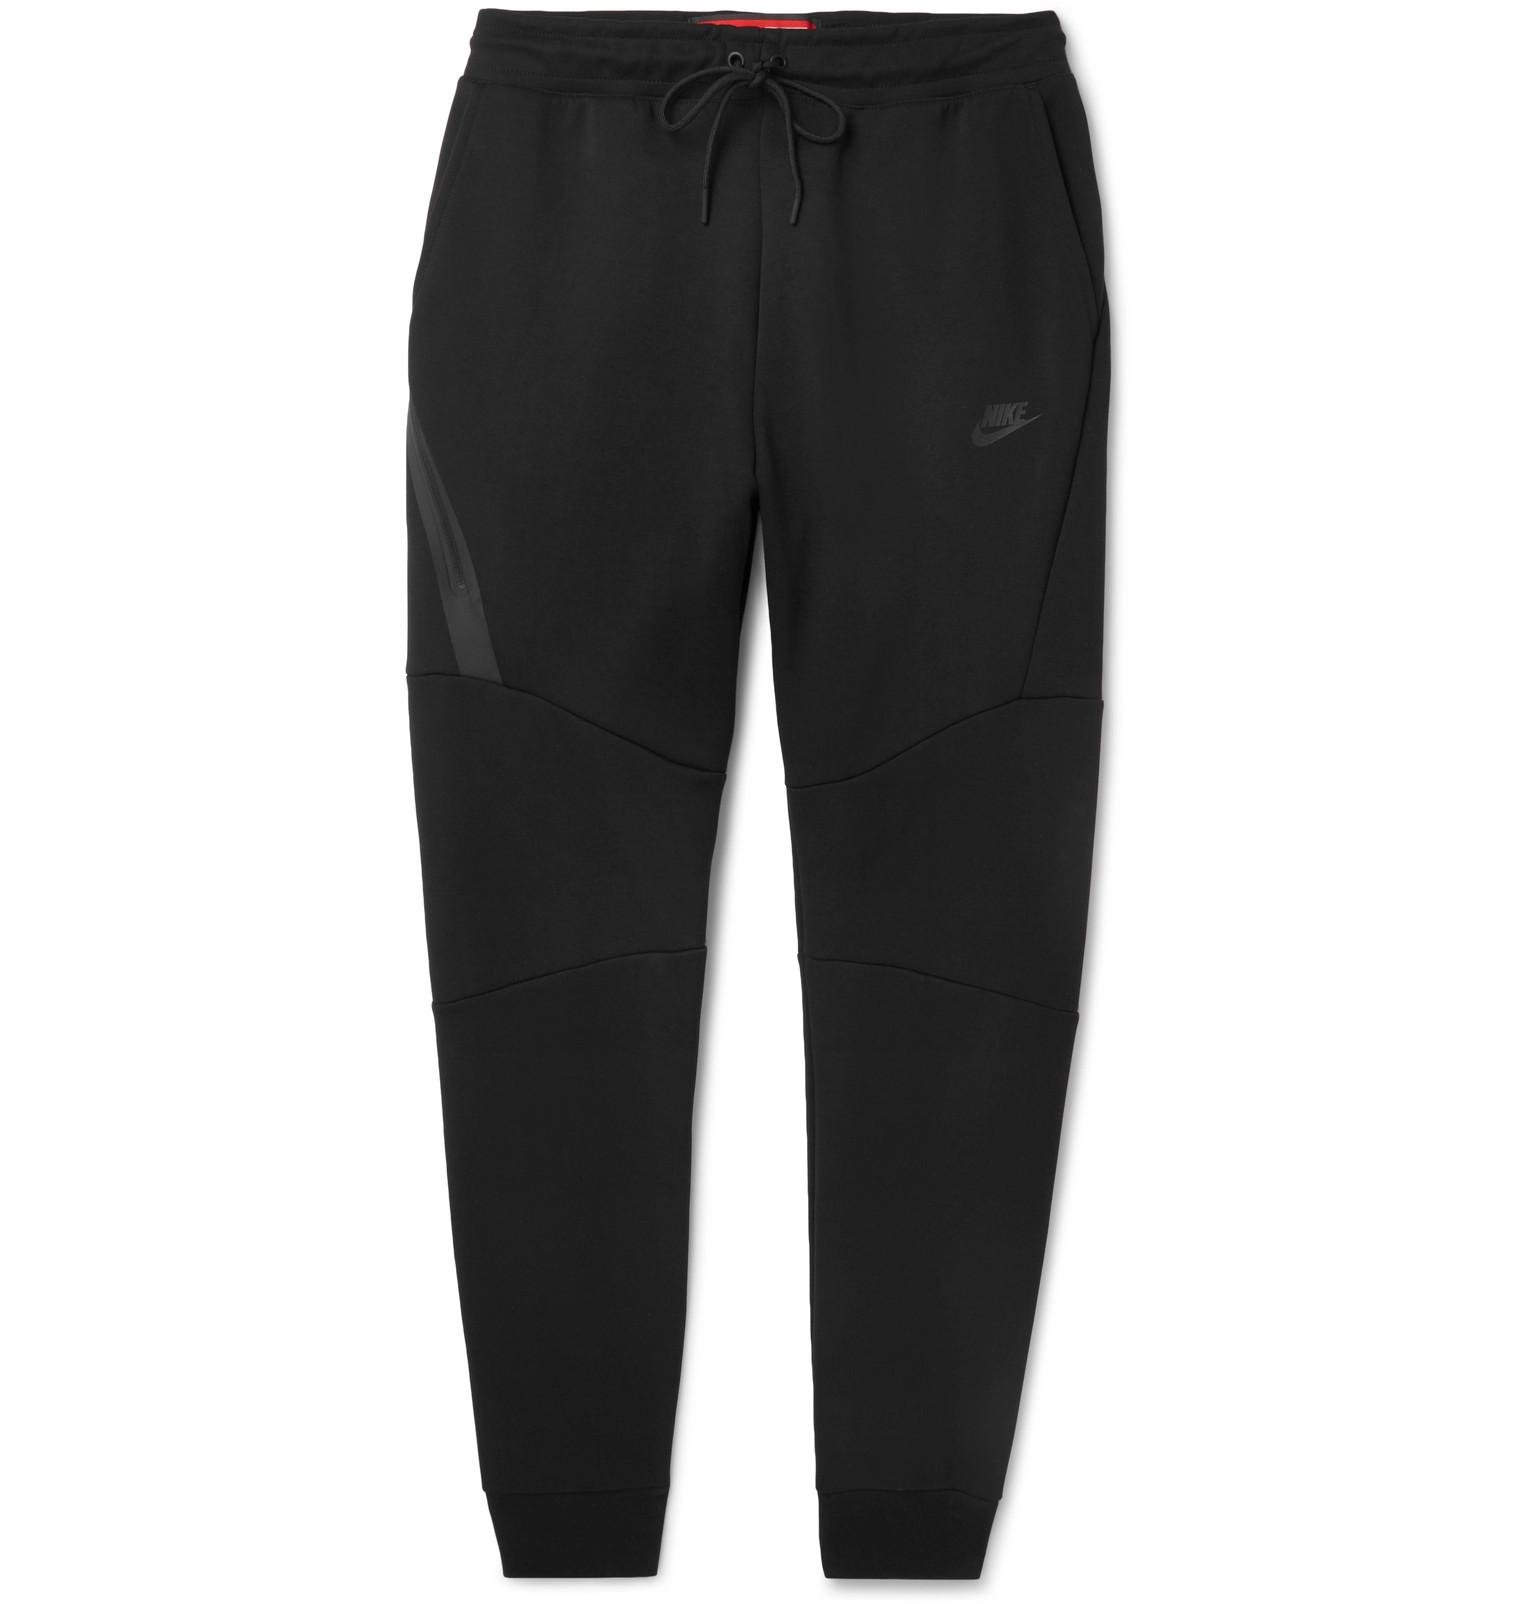 Nike Slim-fit Tapered Cotton-blend Tech Fleece Sweatpants - Petrol TwP0zMwgD